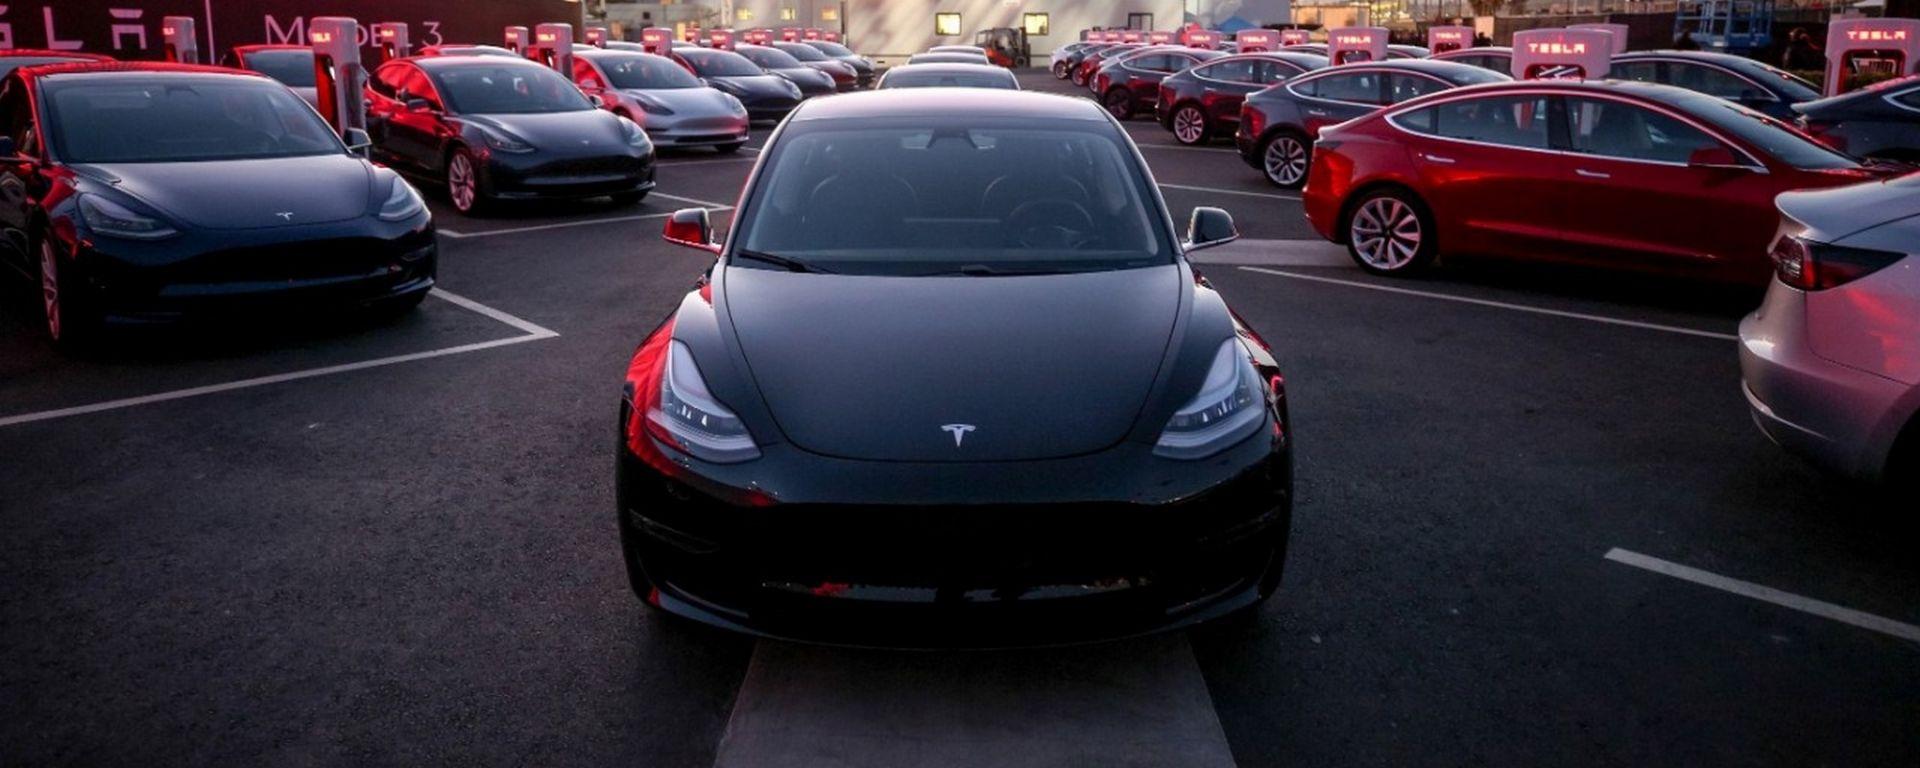 Consegnate le prime Tesla Model 3